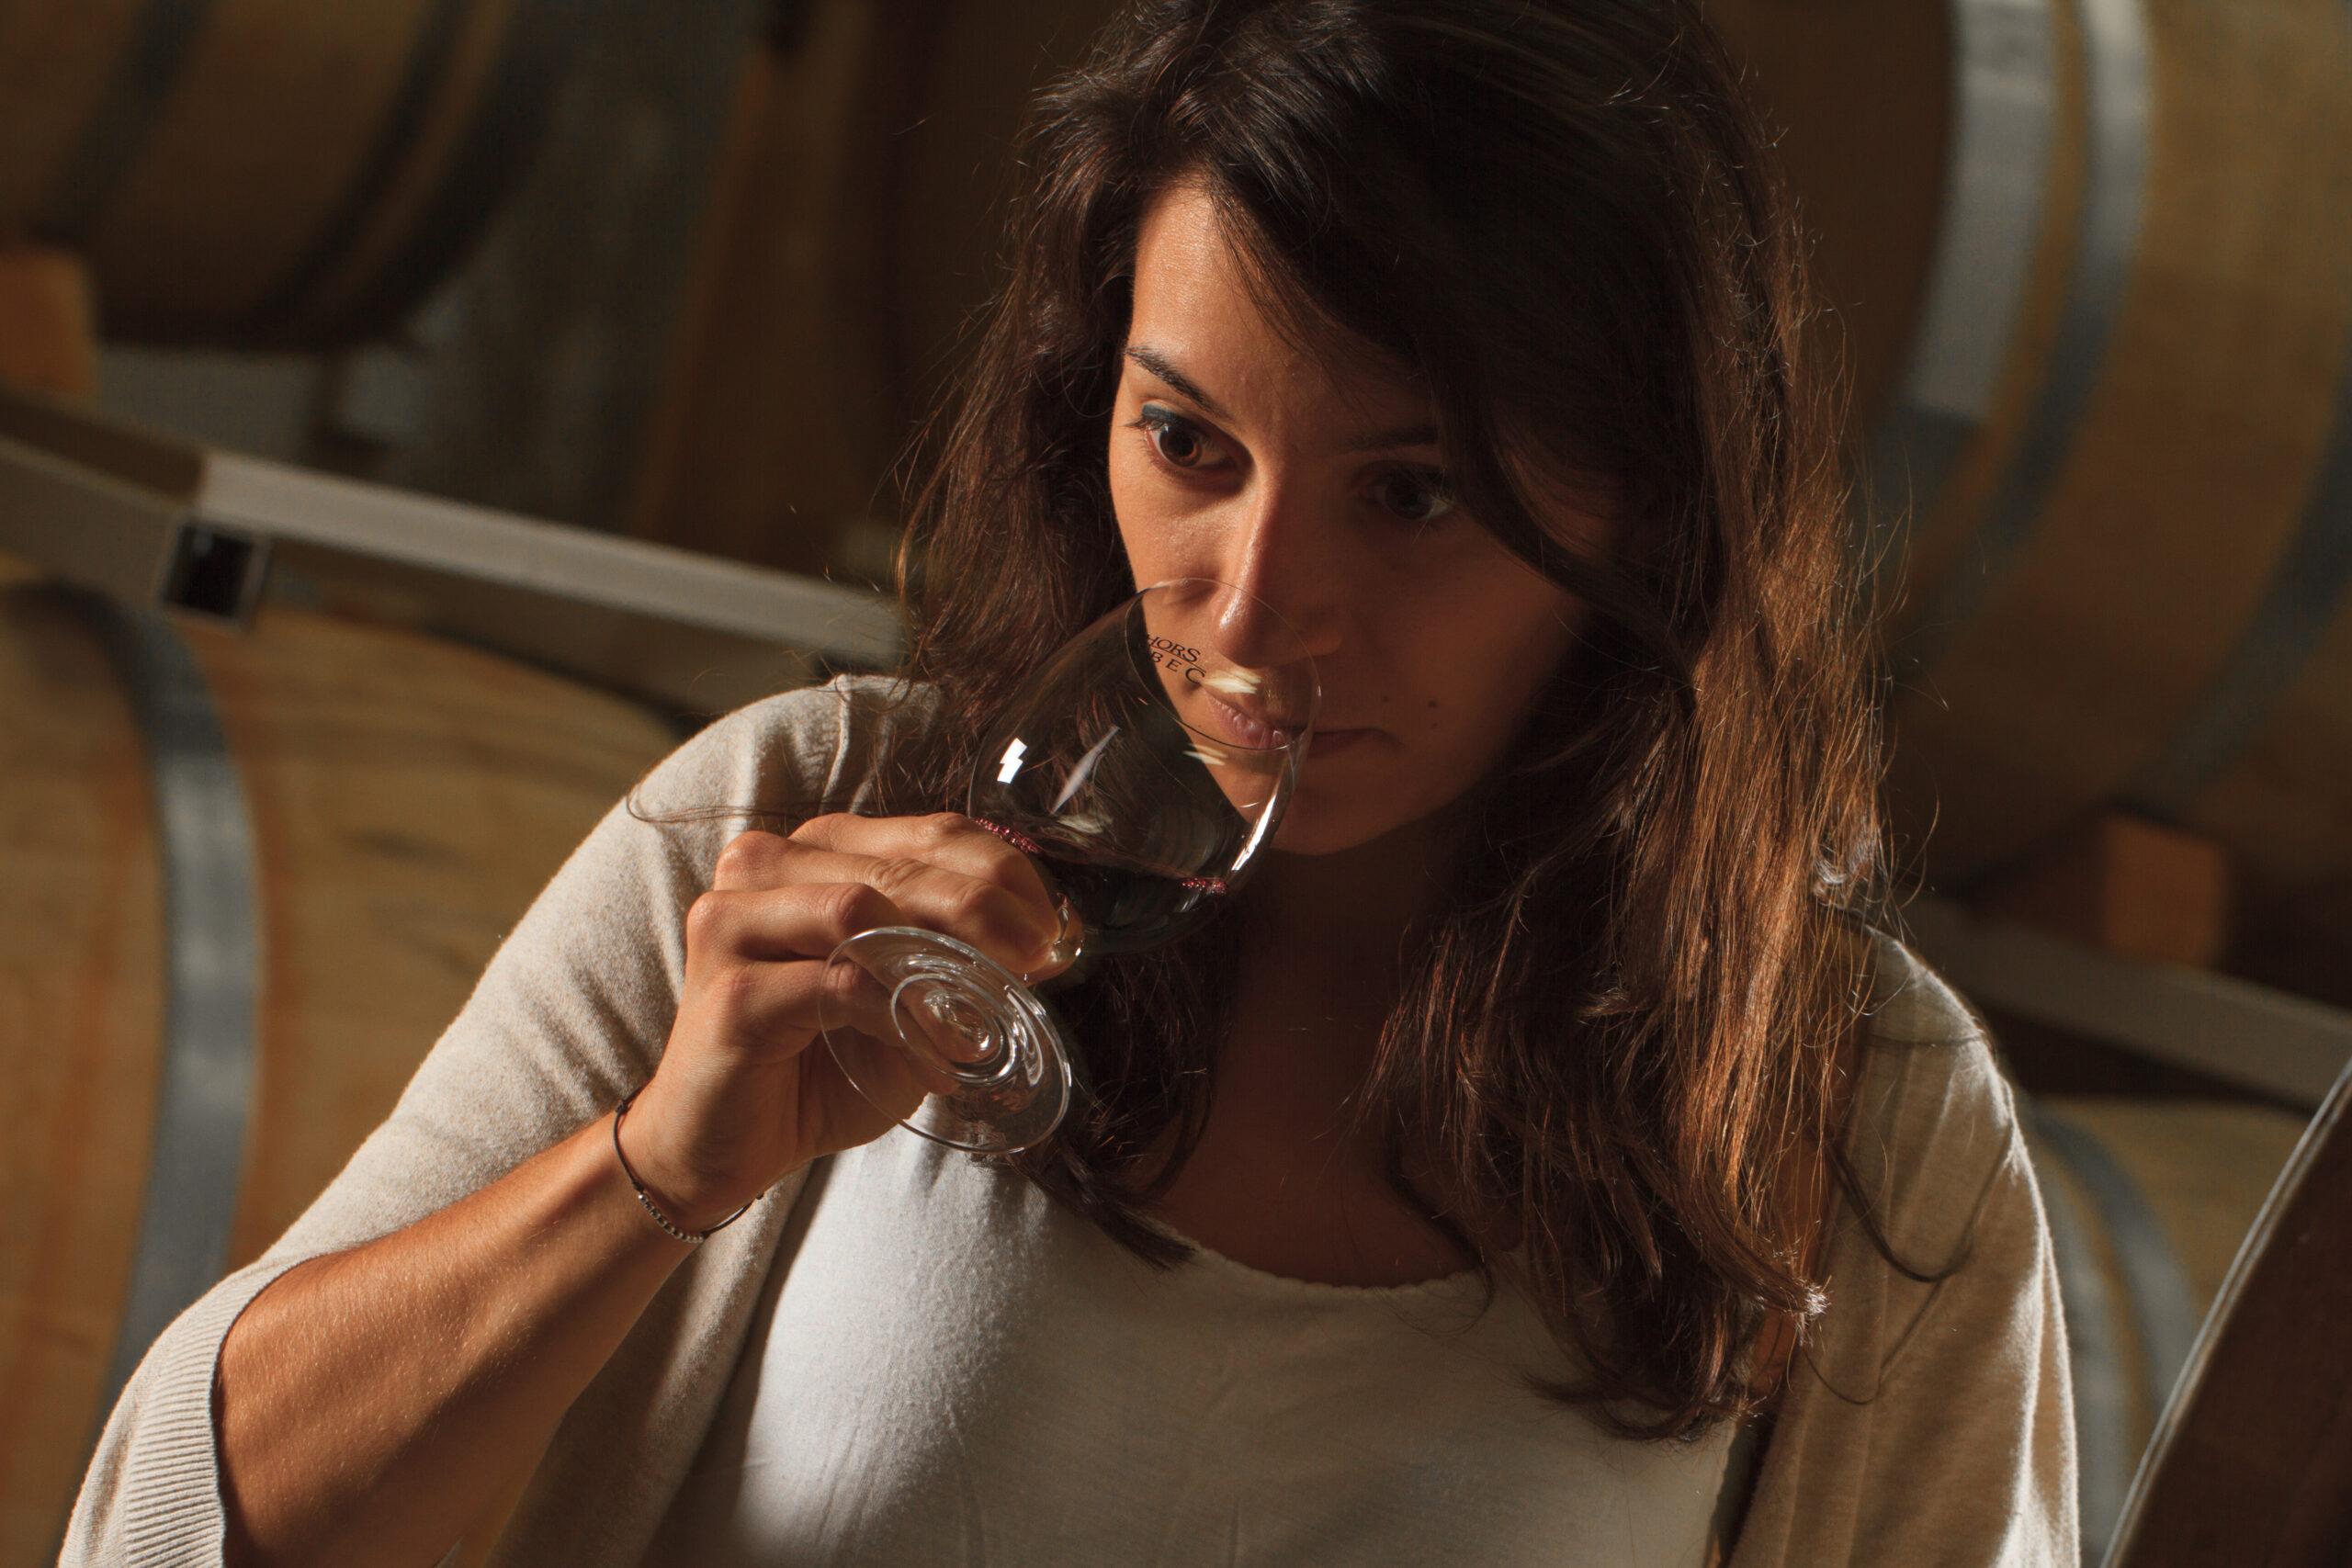 chateau-haut-monplaisir-mathilde-fournie-nos-vins